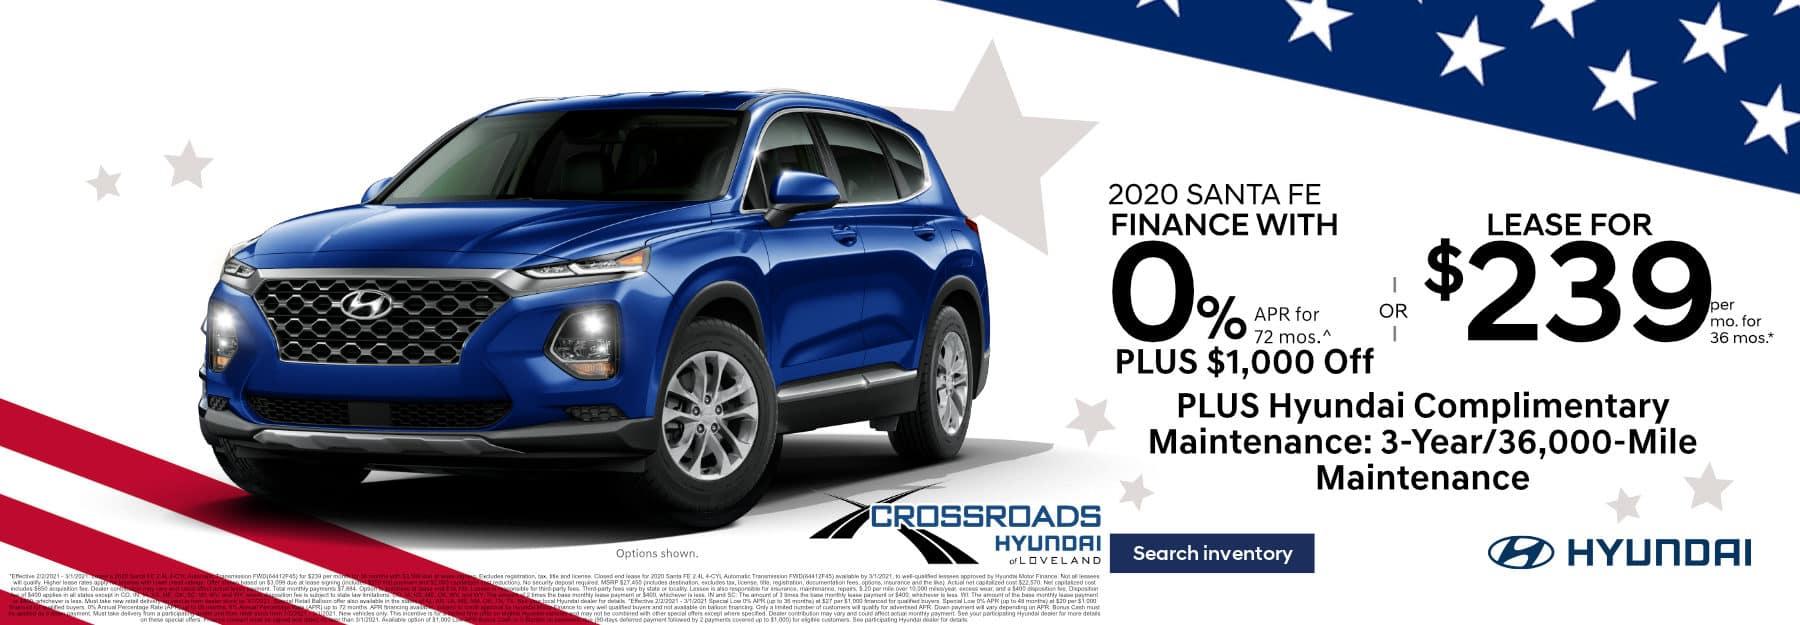 February_2021_Santa Fe_Crossroads_Hyundai